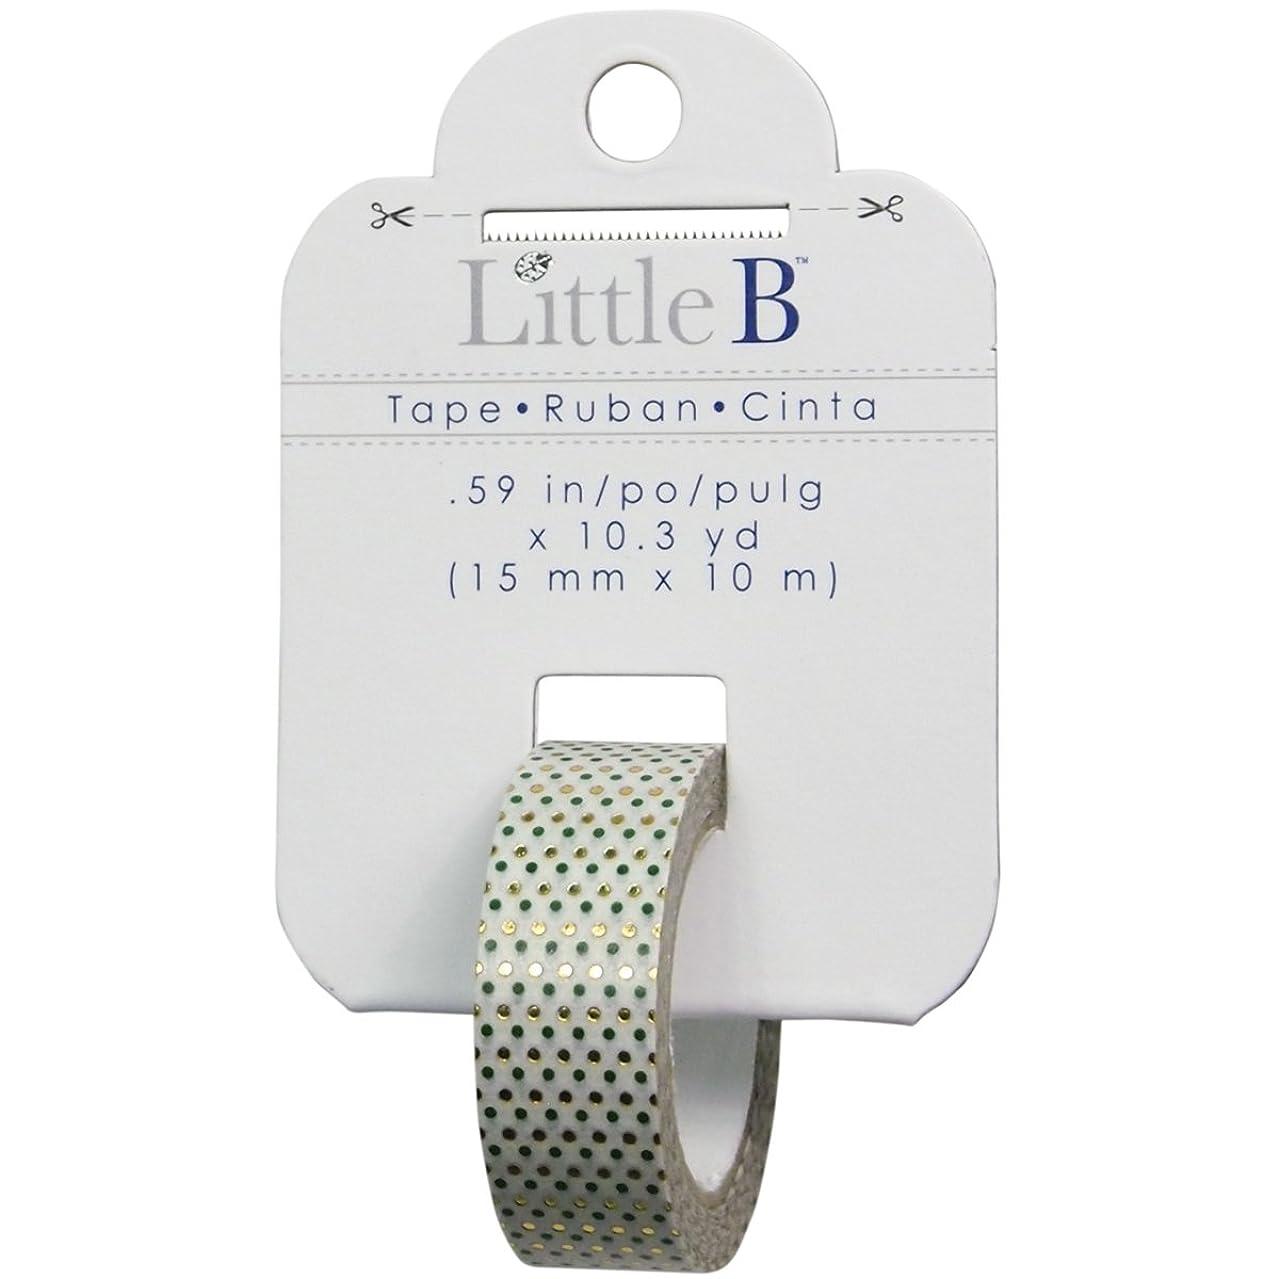 Little B 100567 Decorative Foil Tape, Gold Foil Green Polka Dots